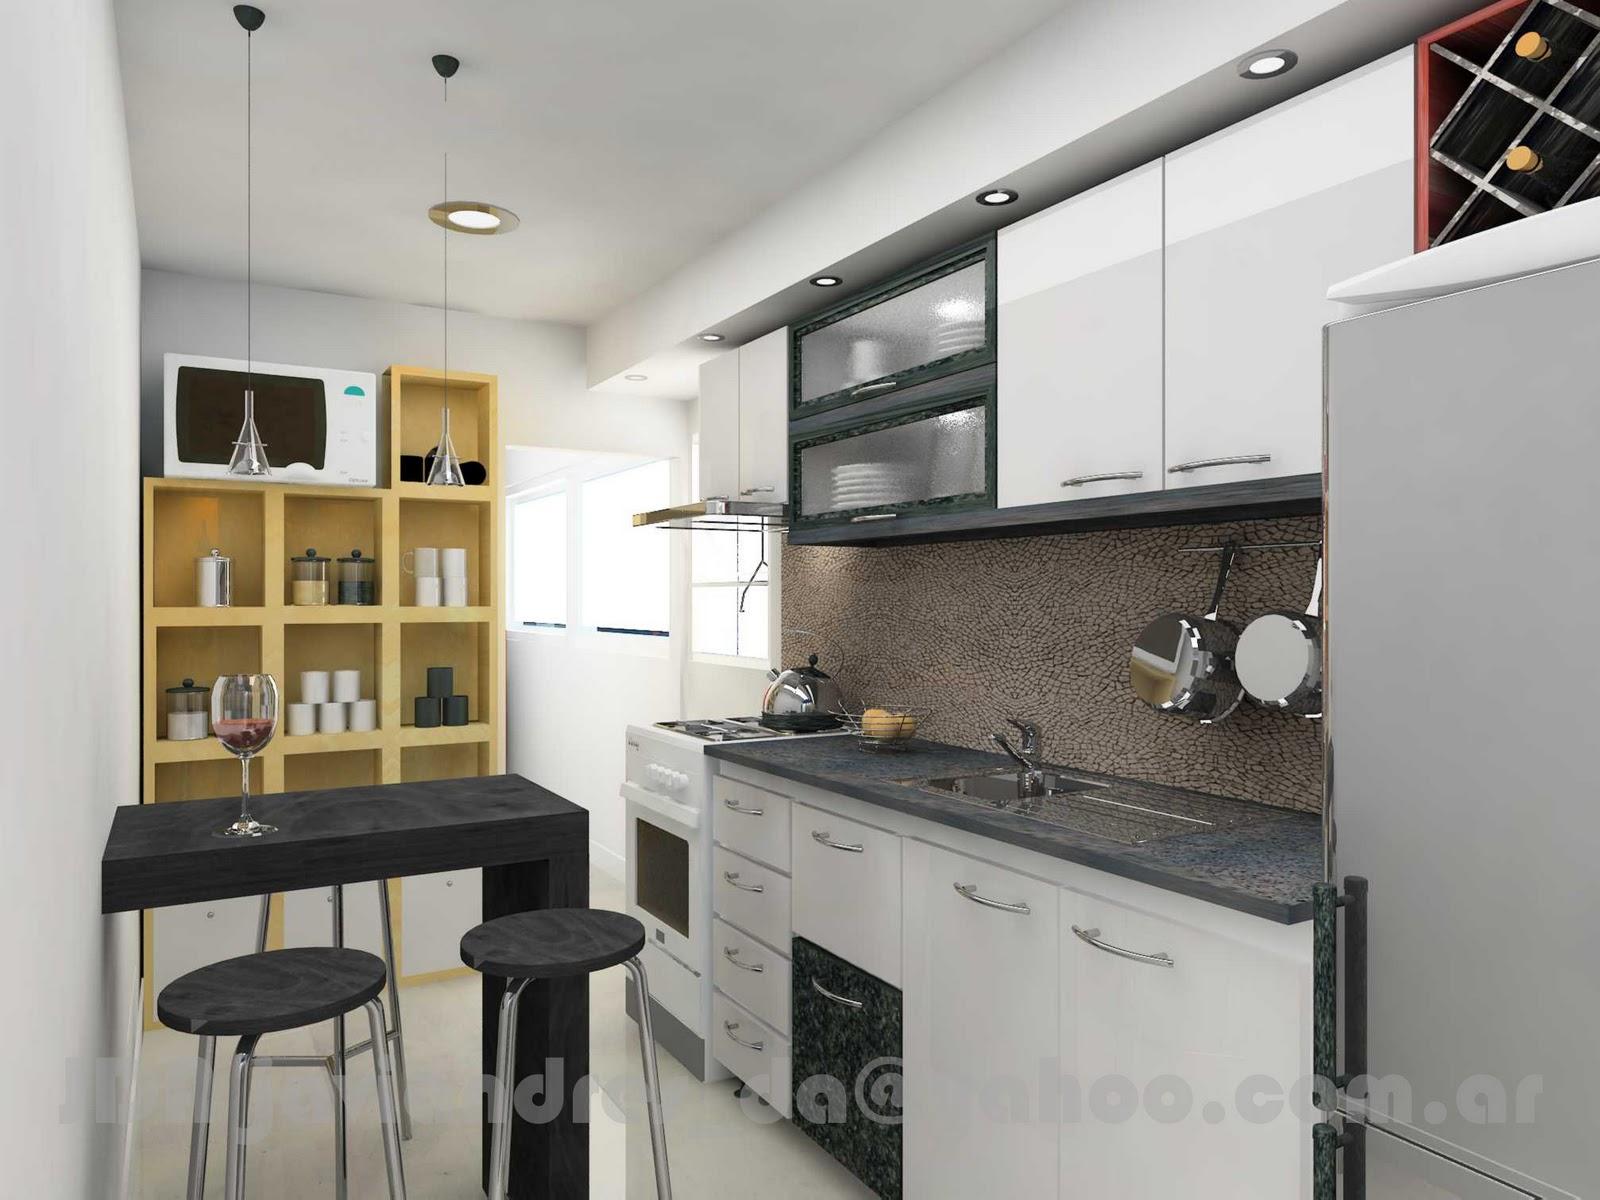 Arquitec maquetas remodelaci n de cocina dise o 3d for Diseno de muebles 3d